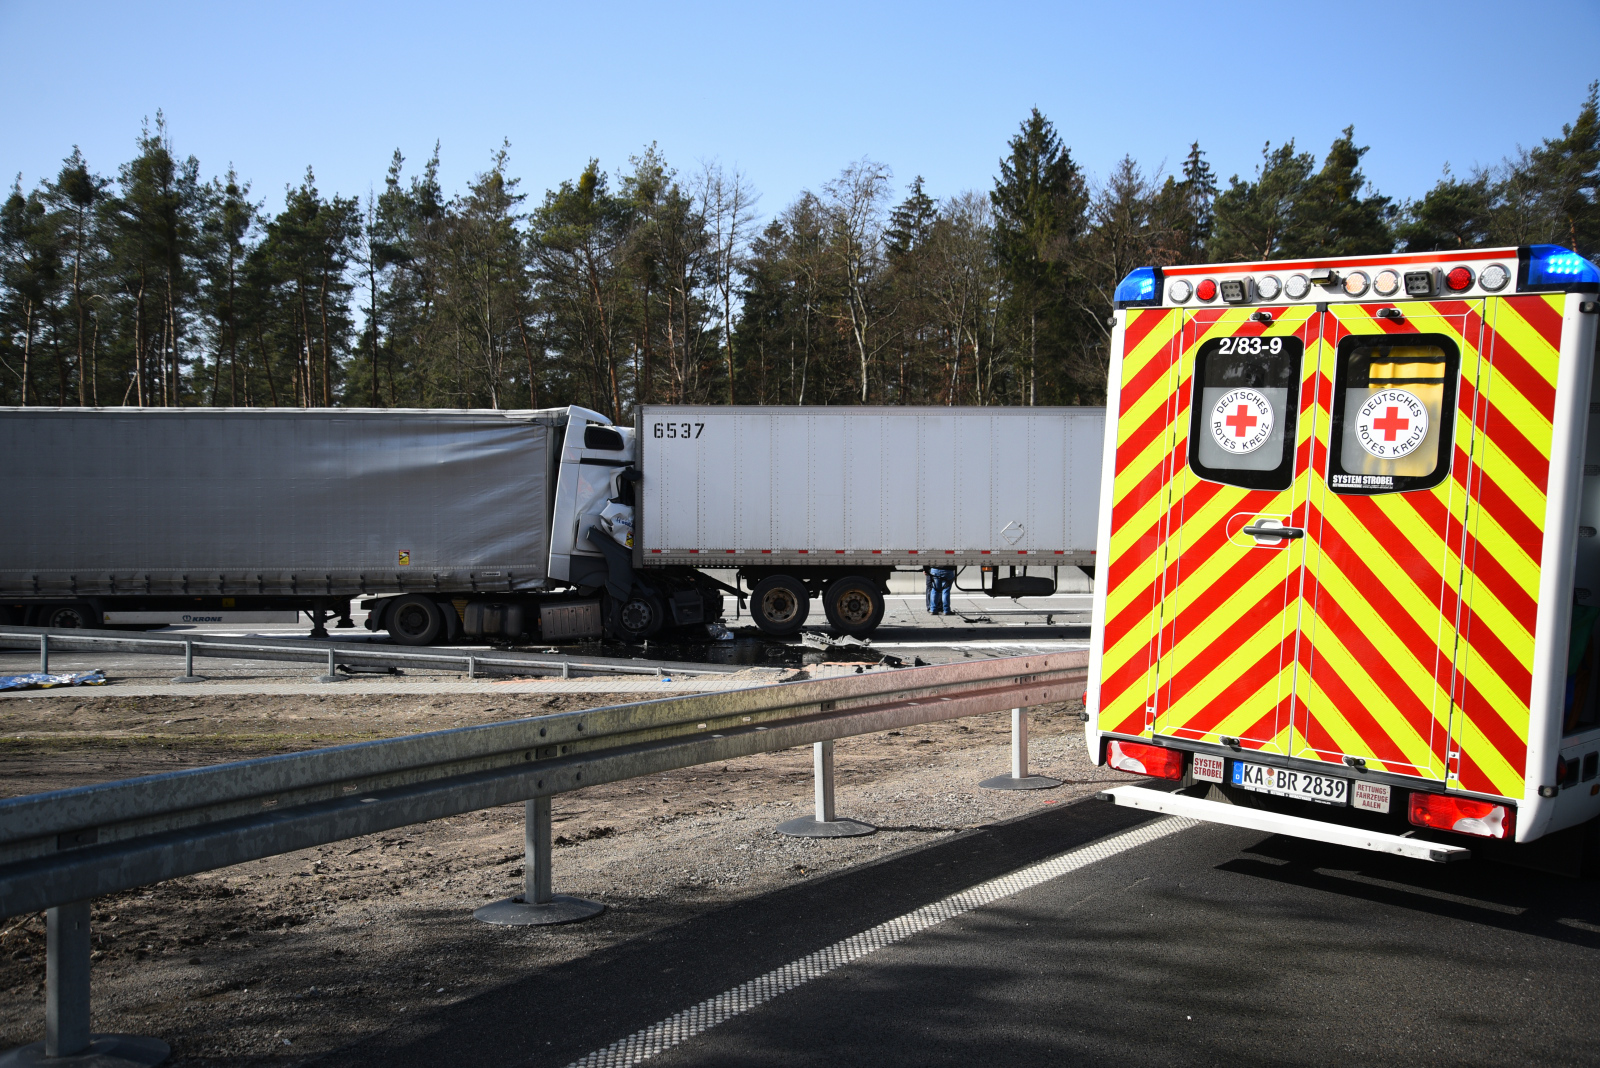 Kronau: Lkw-Unfall am Stauende - A5 voll gesperrt